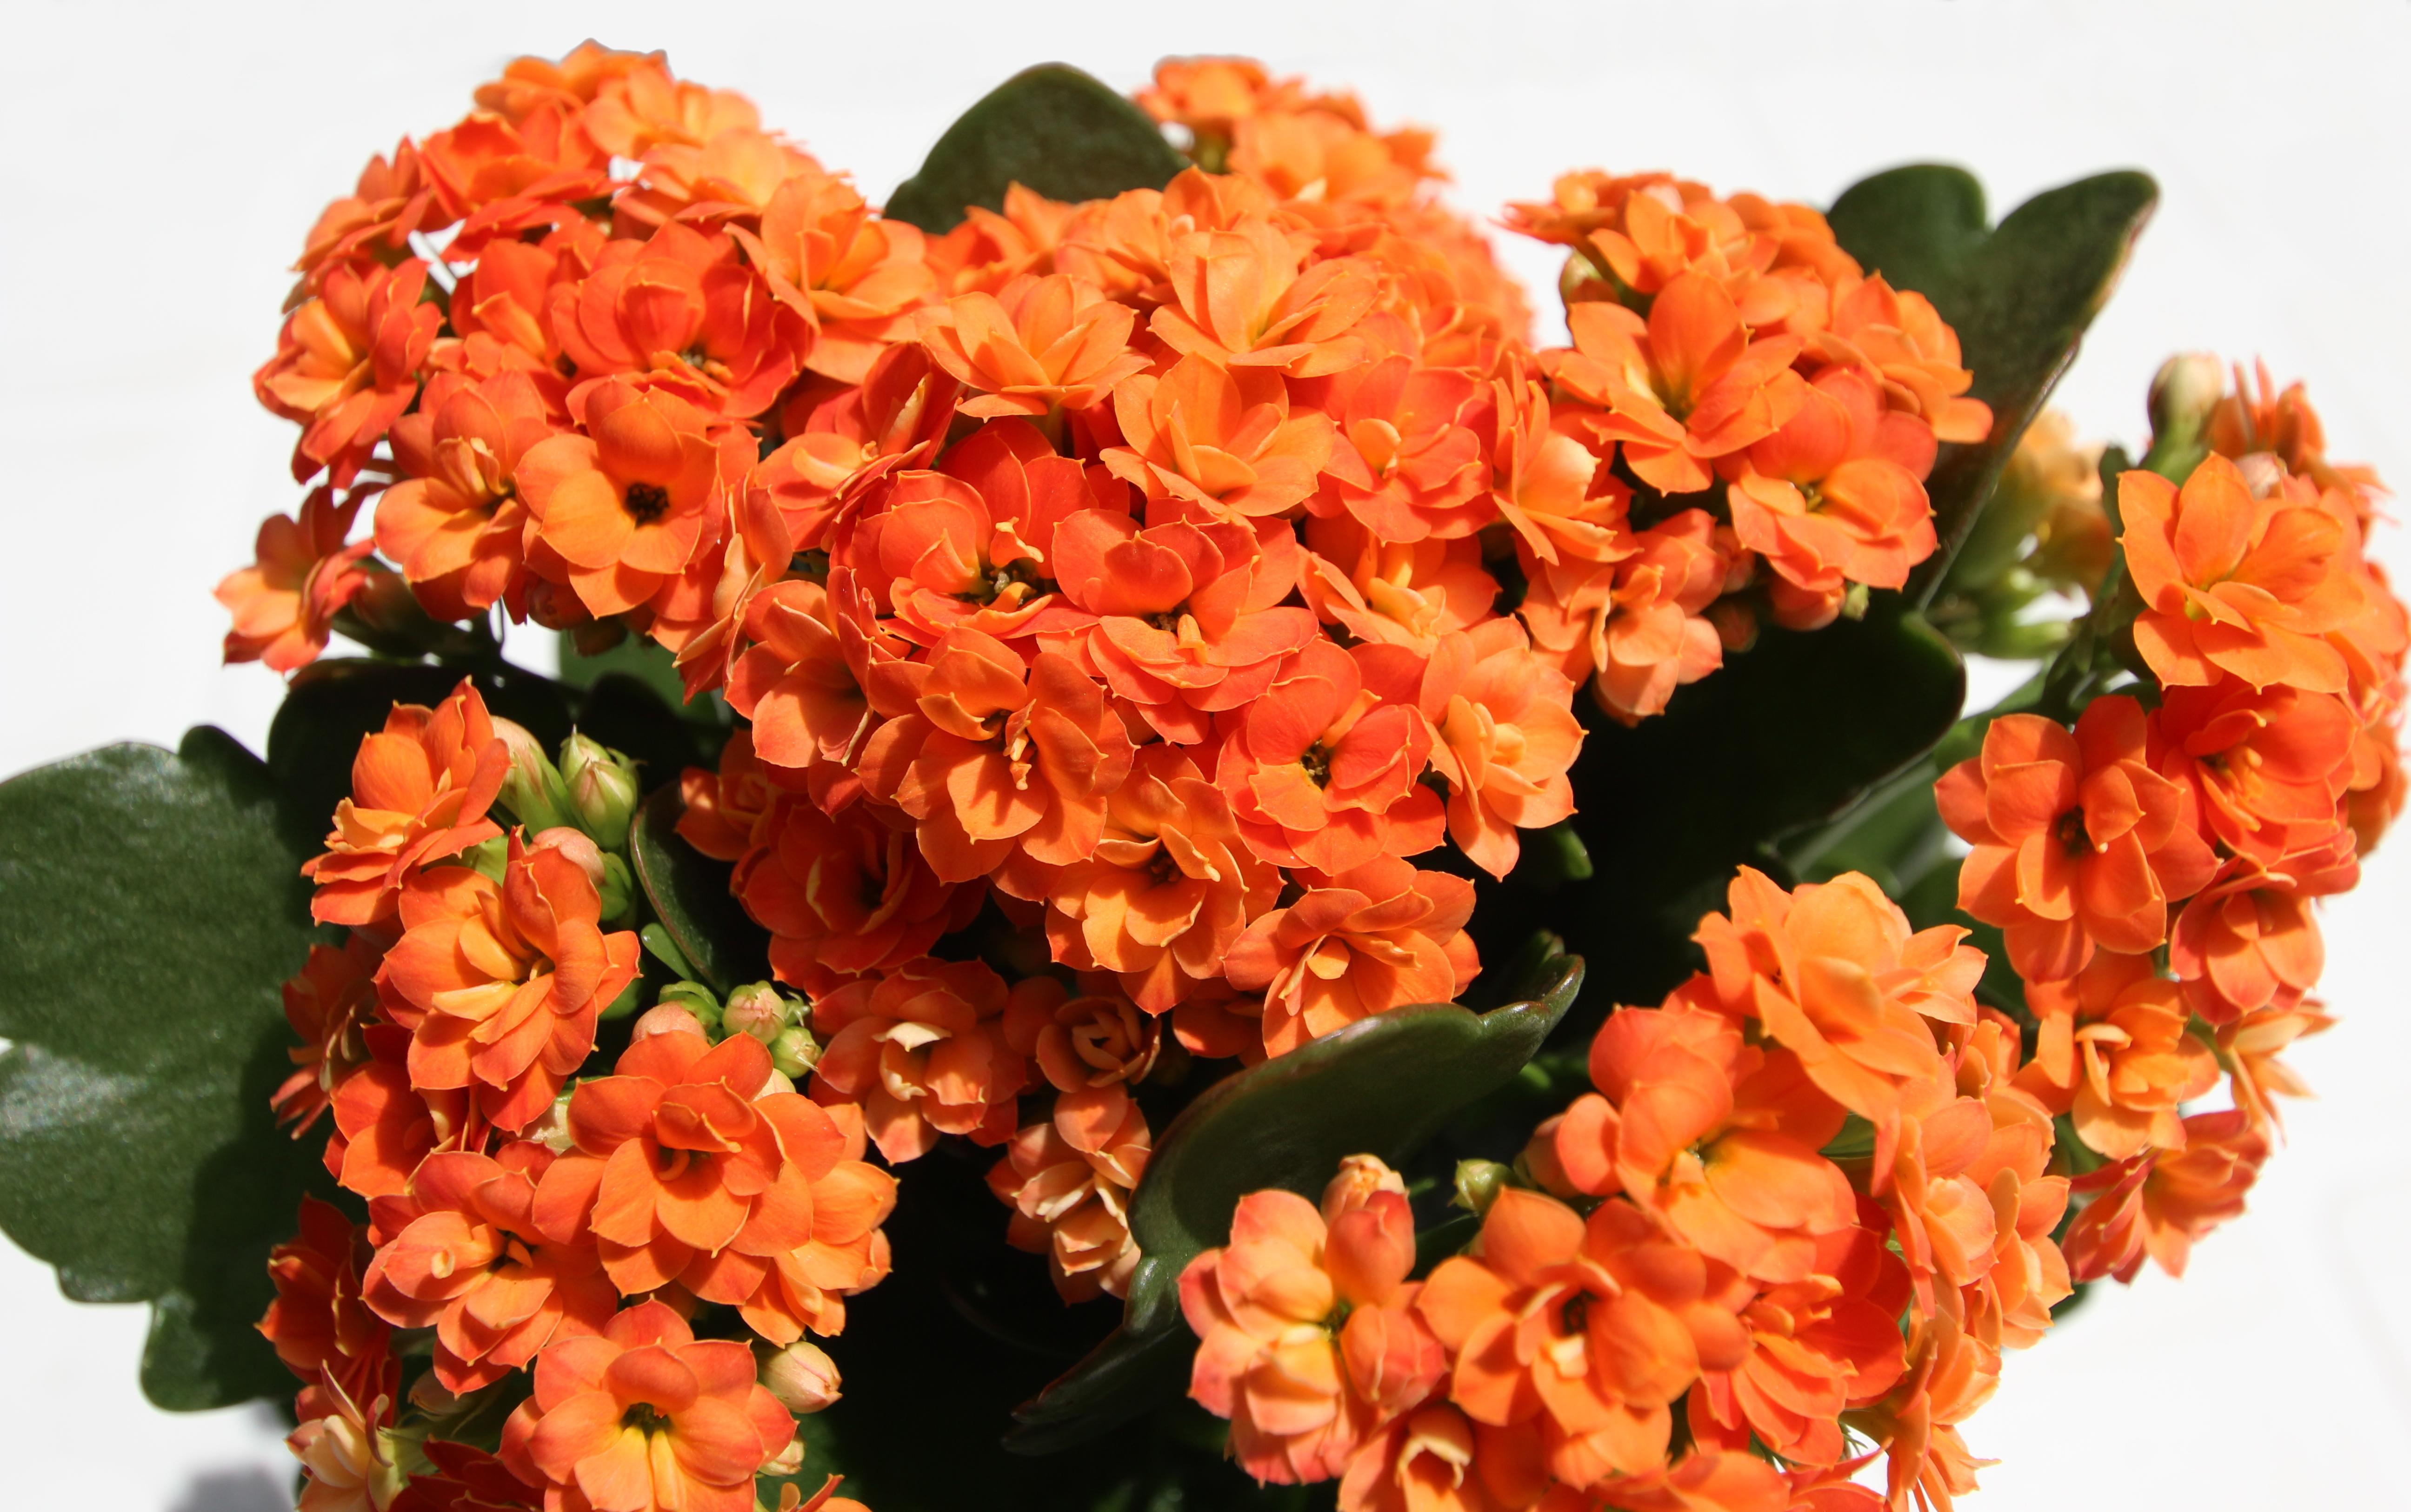 File Kalanchoe Blossfeldiana Forme Horticole A Fleurs Doubles 4